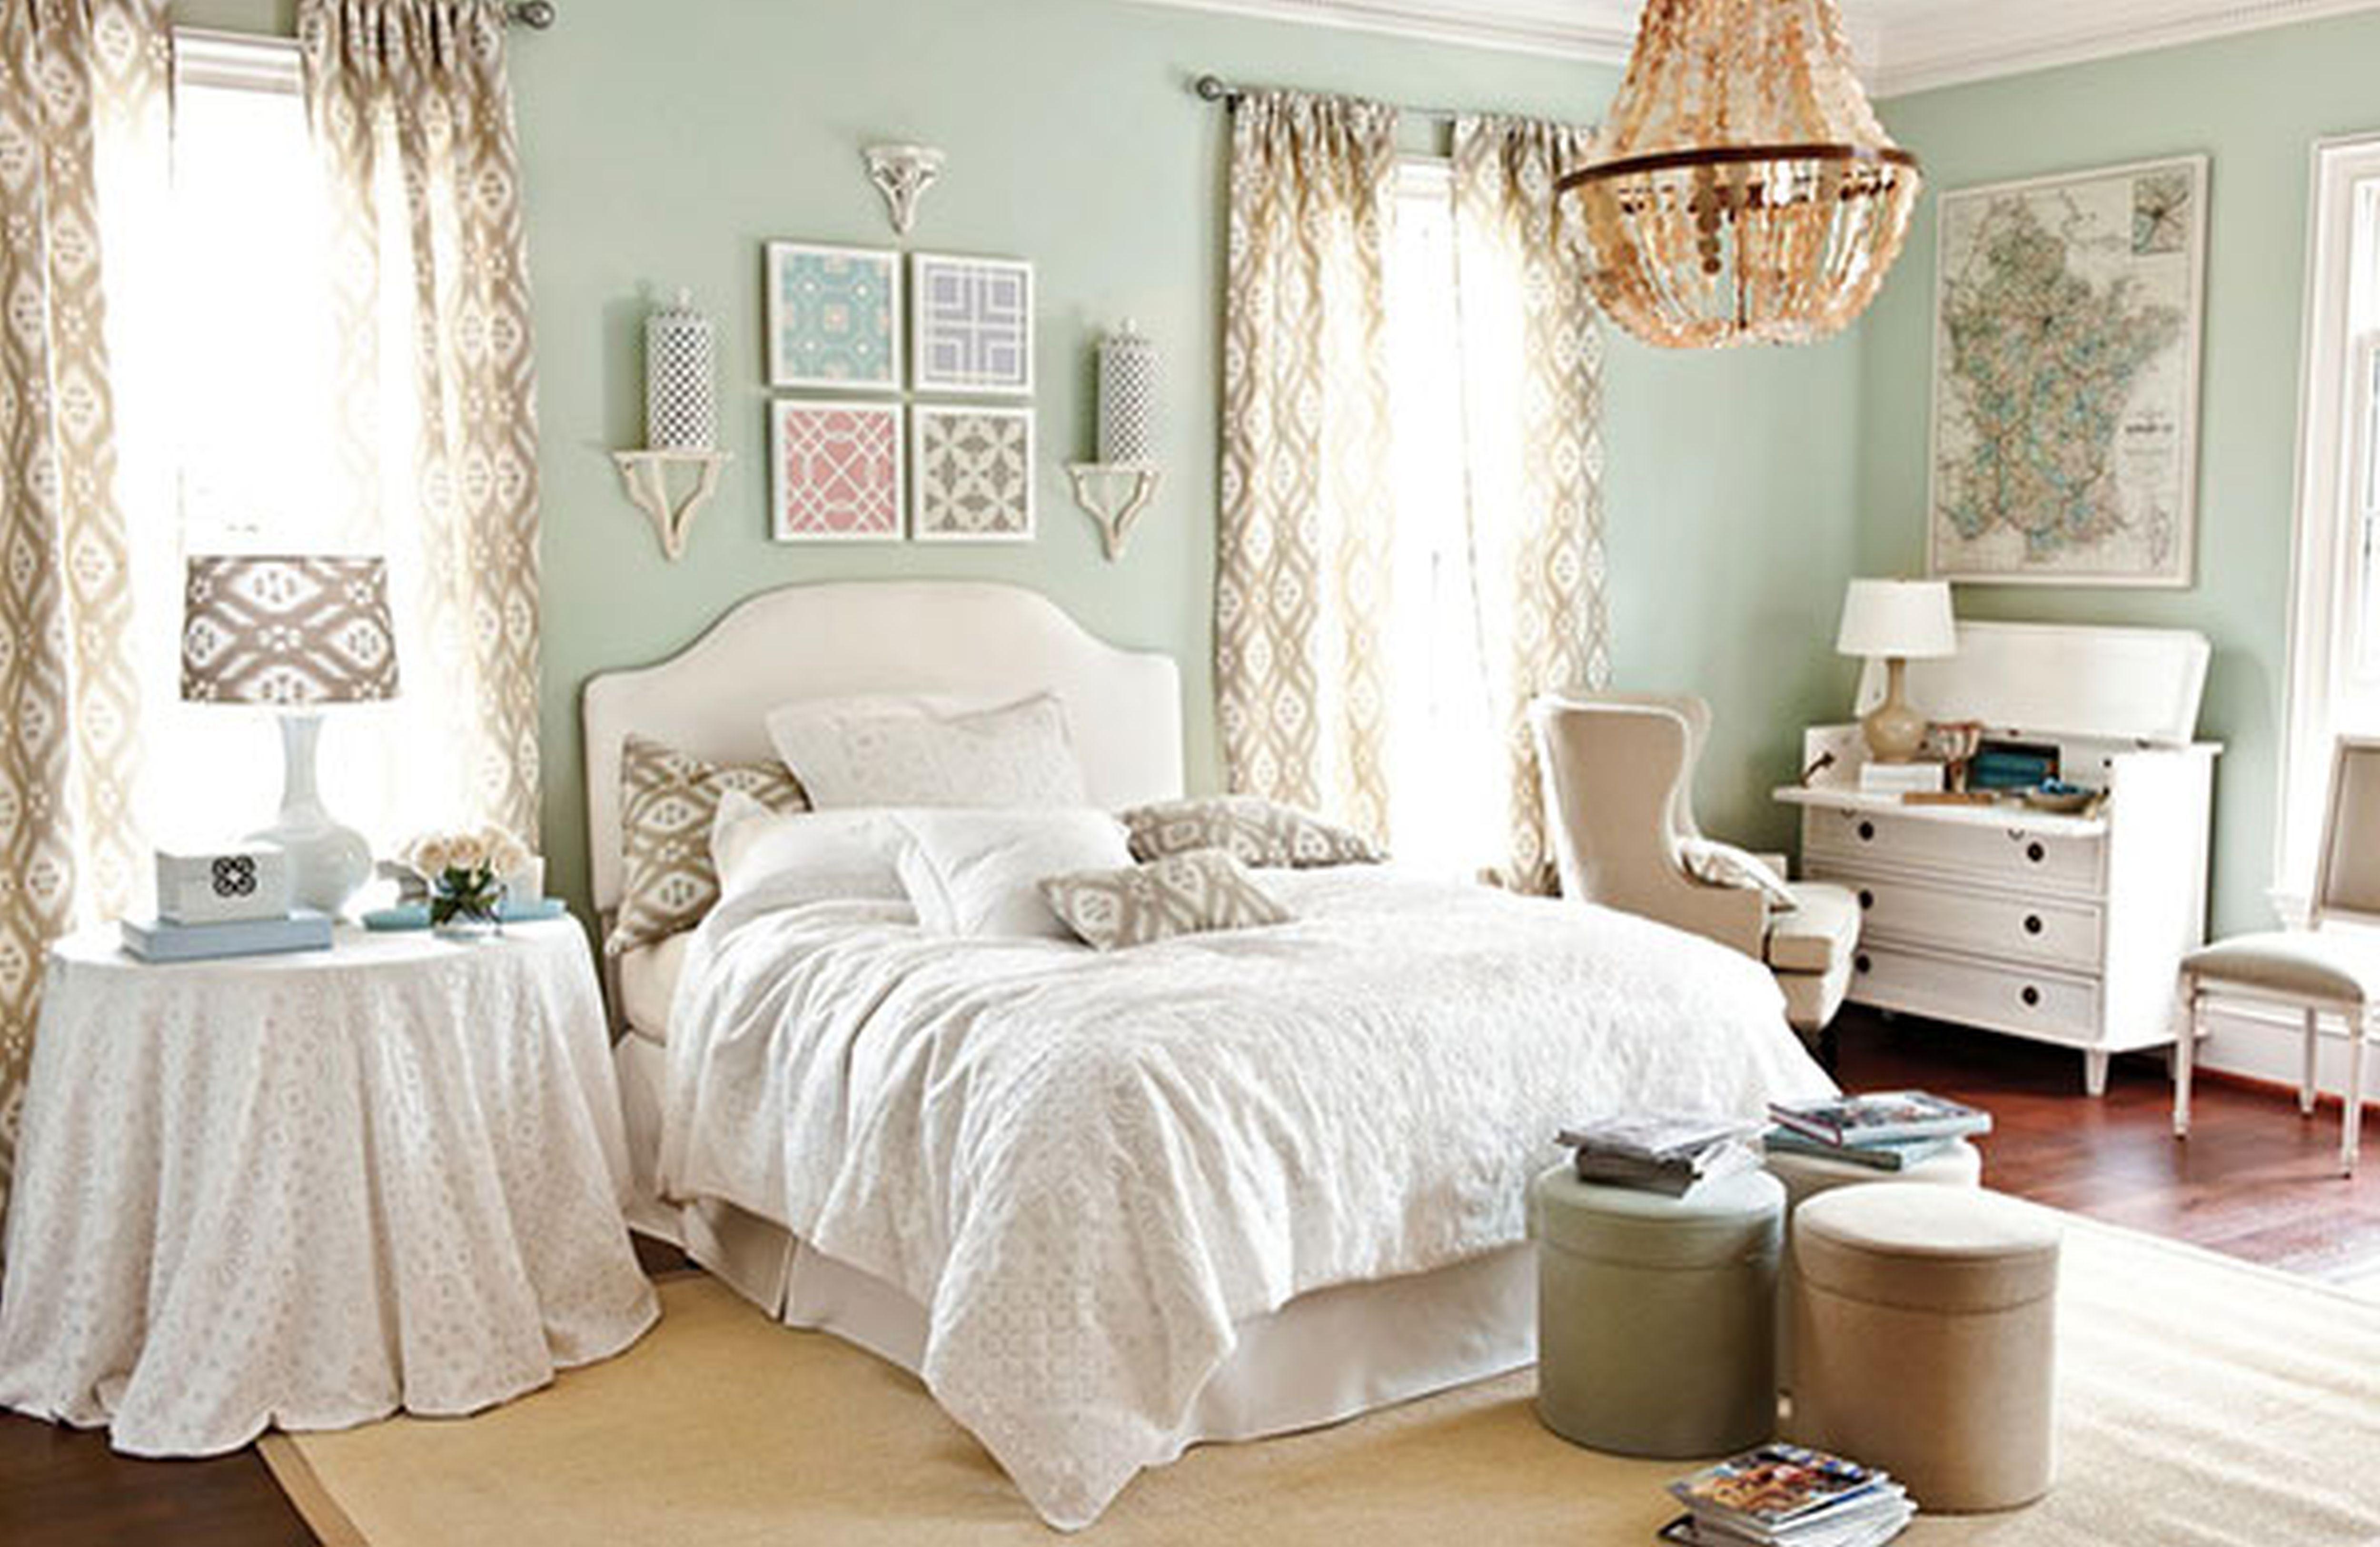 Bedroommesmerizing cute bedroom ideas for women bedroom picture